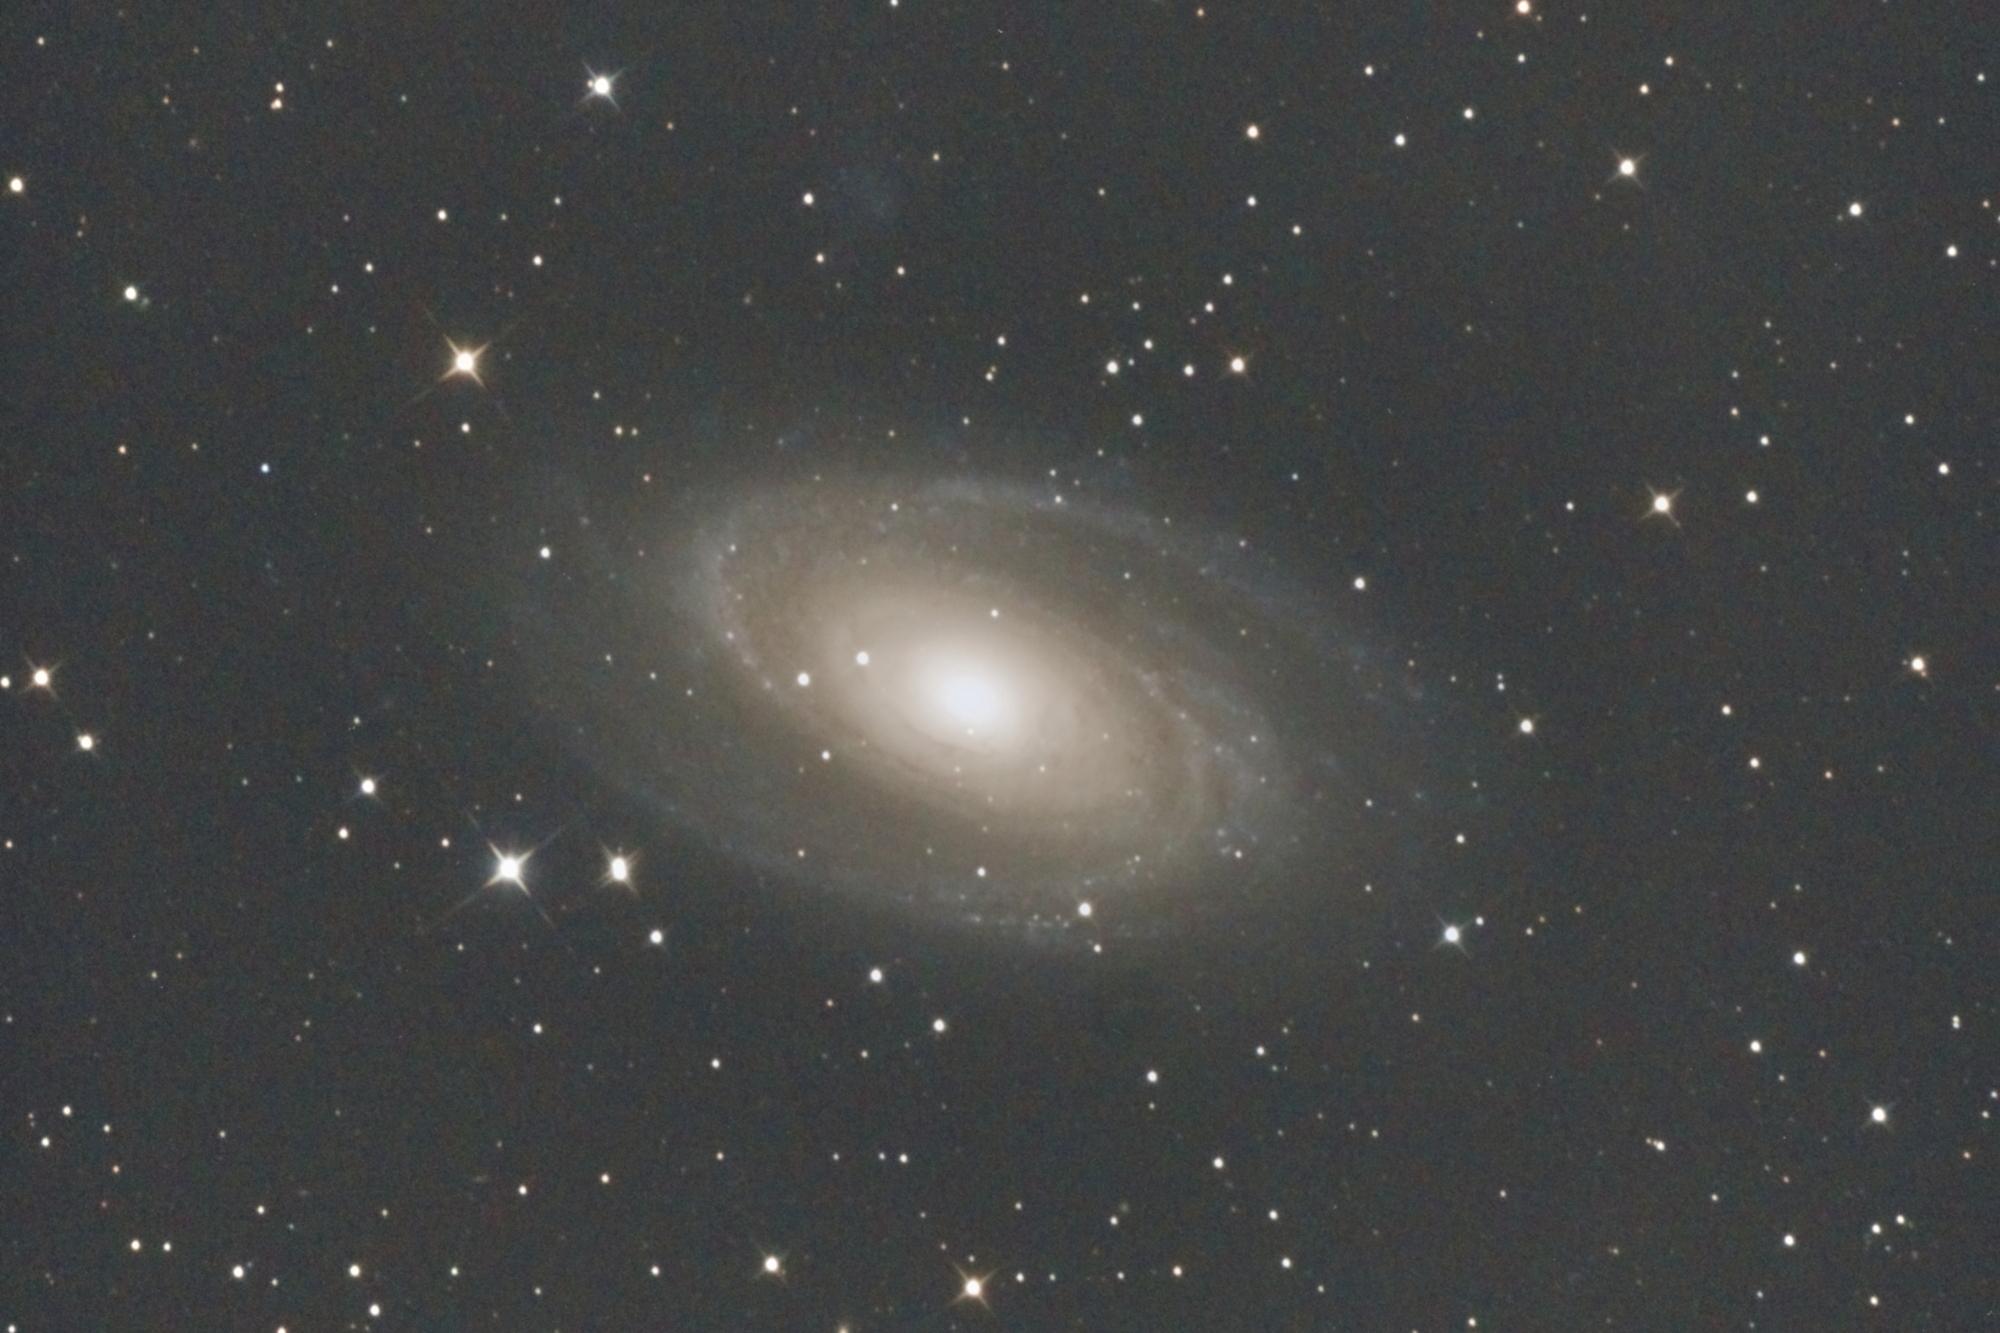 f:id:snct-astro:20170228144933j:plain